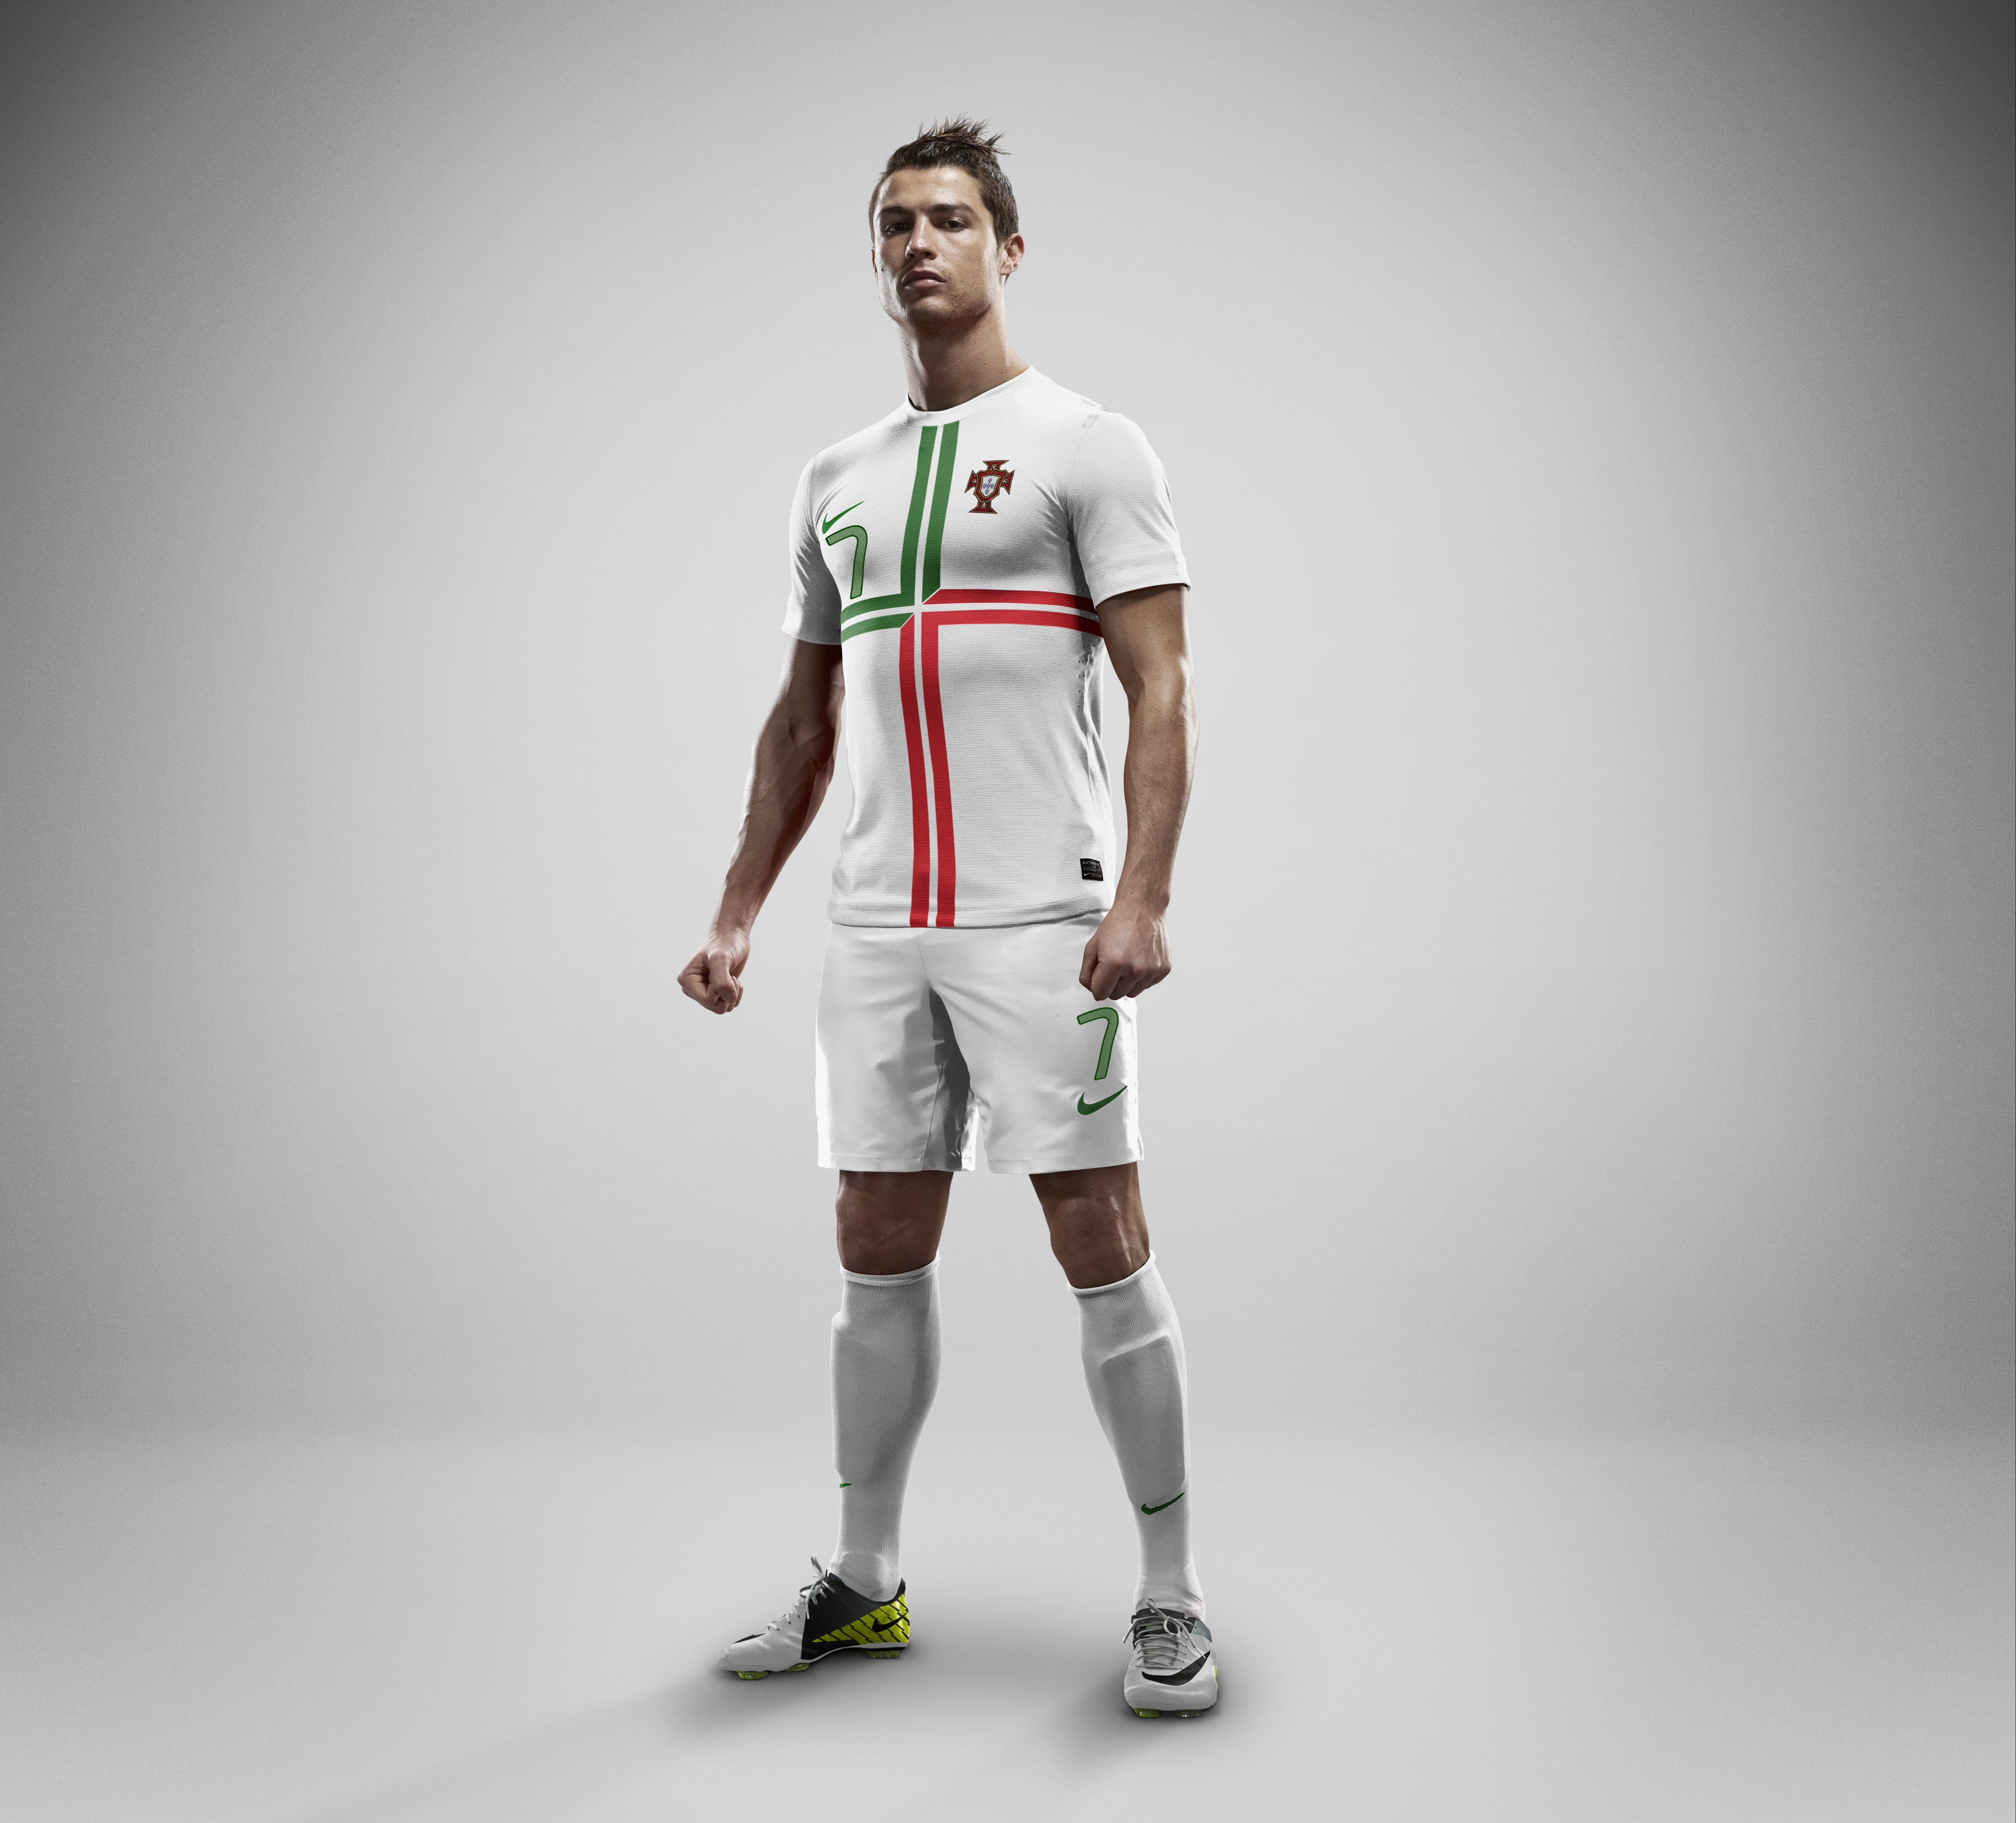 Cristiano ronaldo portugal real madrid Fuballteams 5487x4961